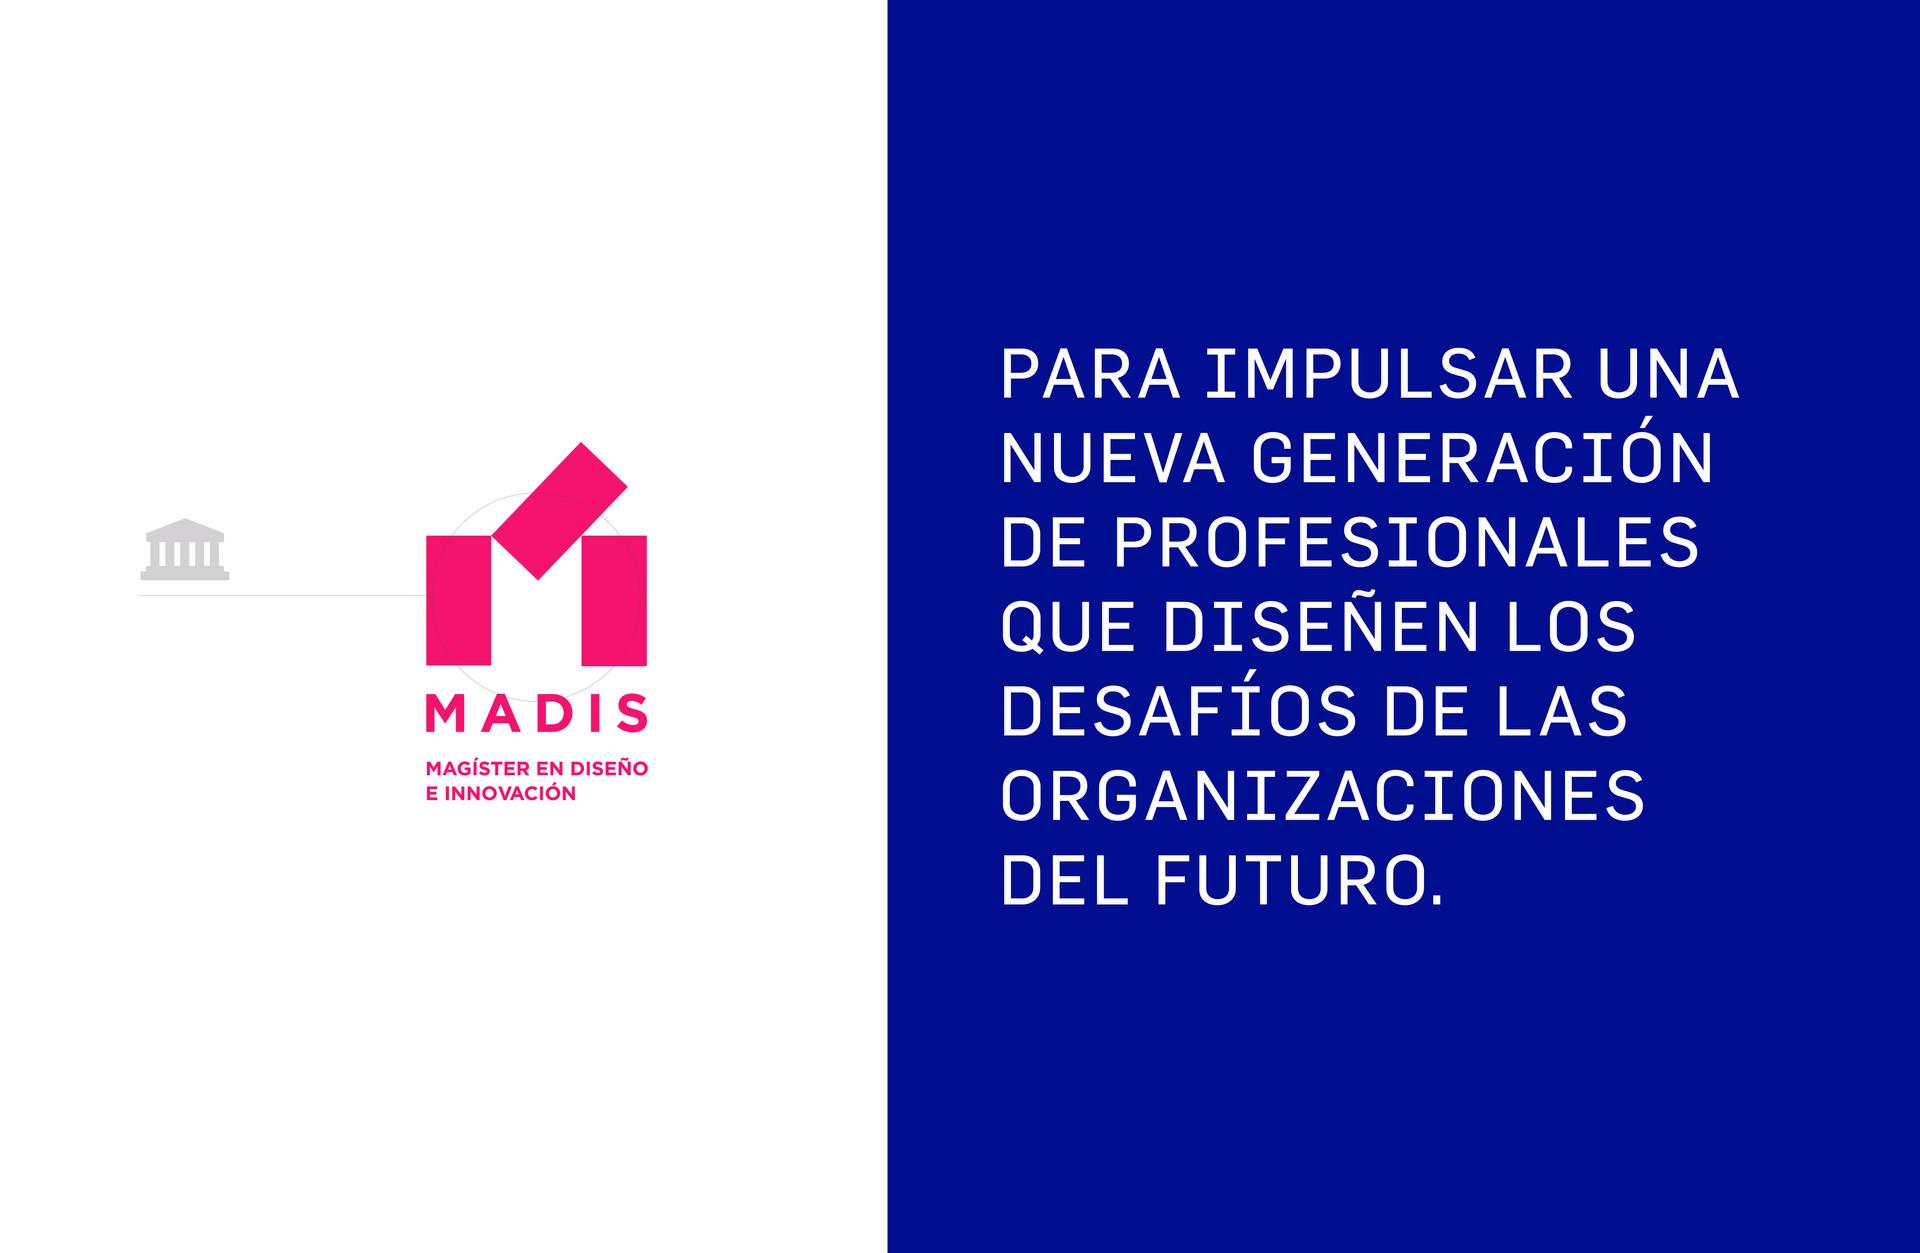 MADIS_FINAL-02.jpg